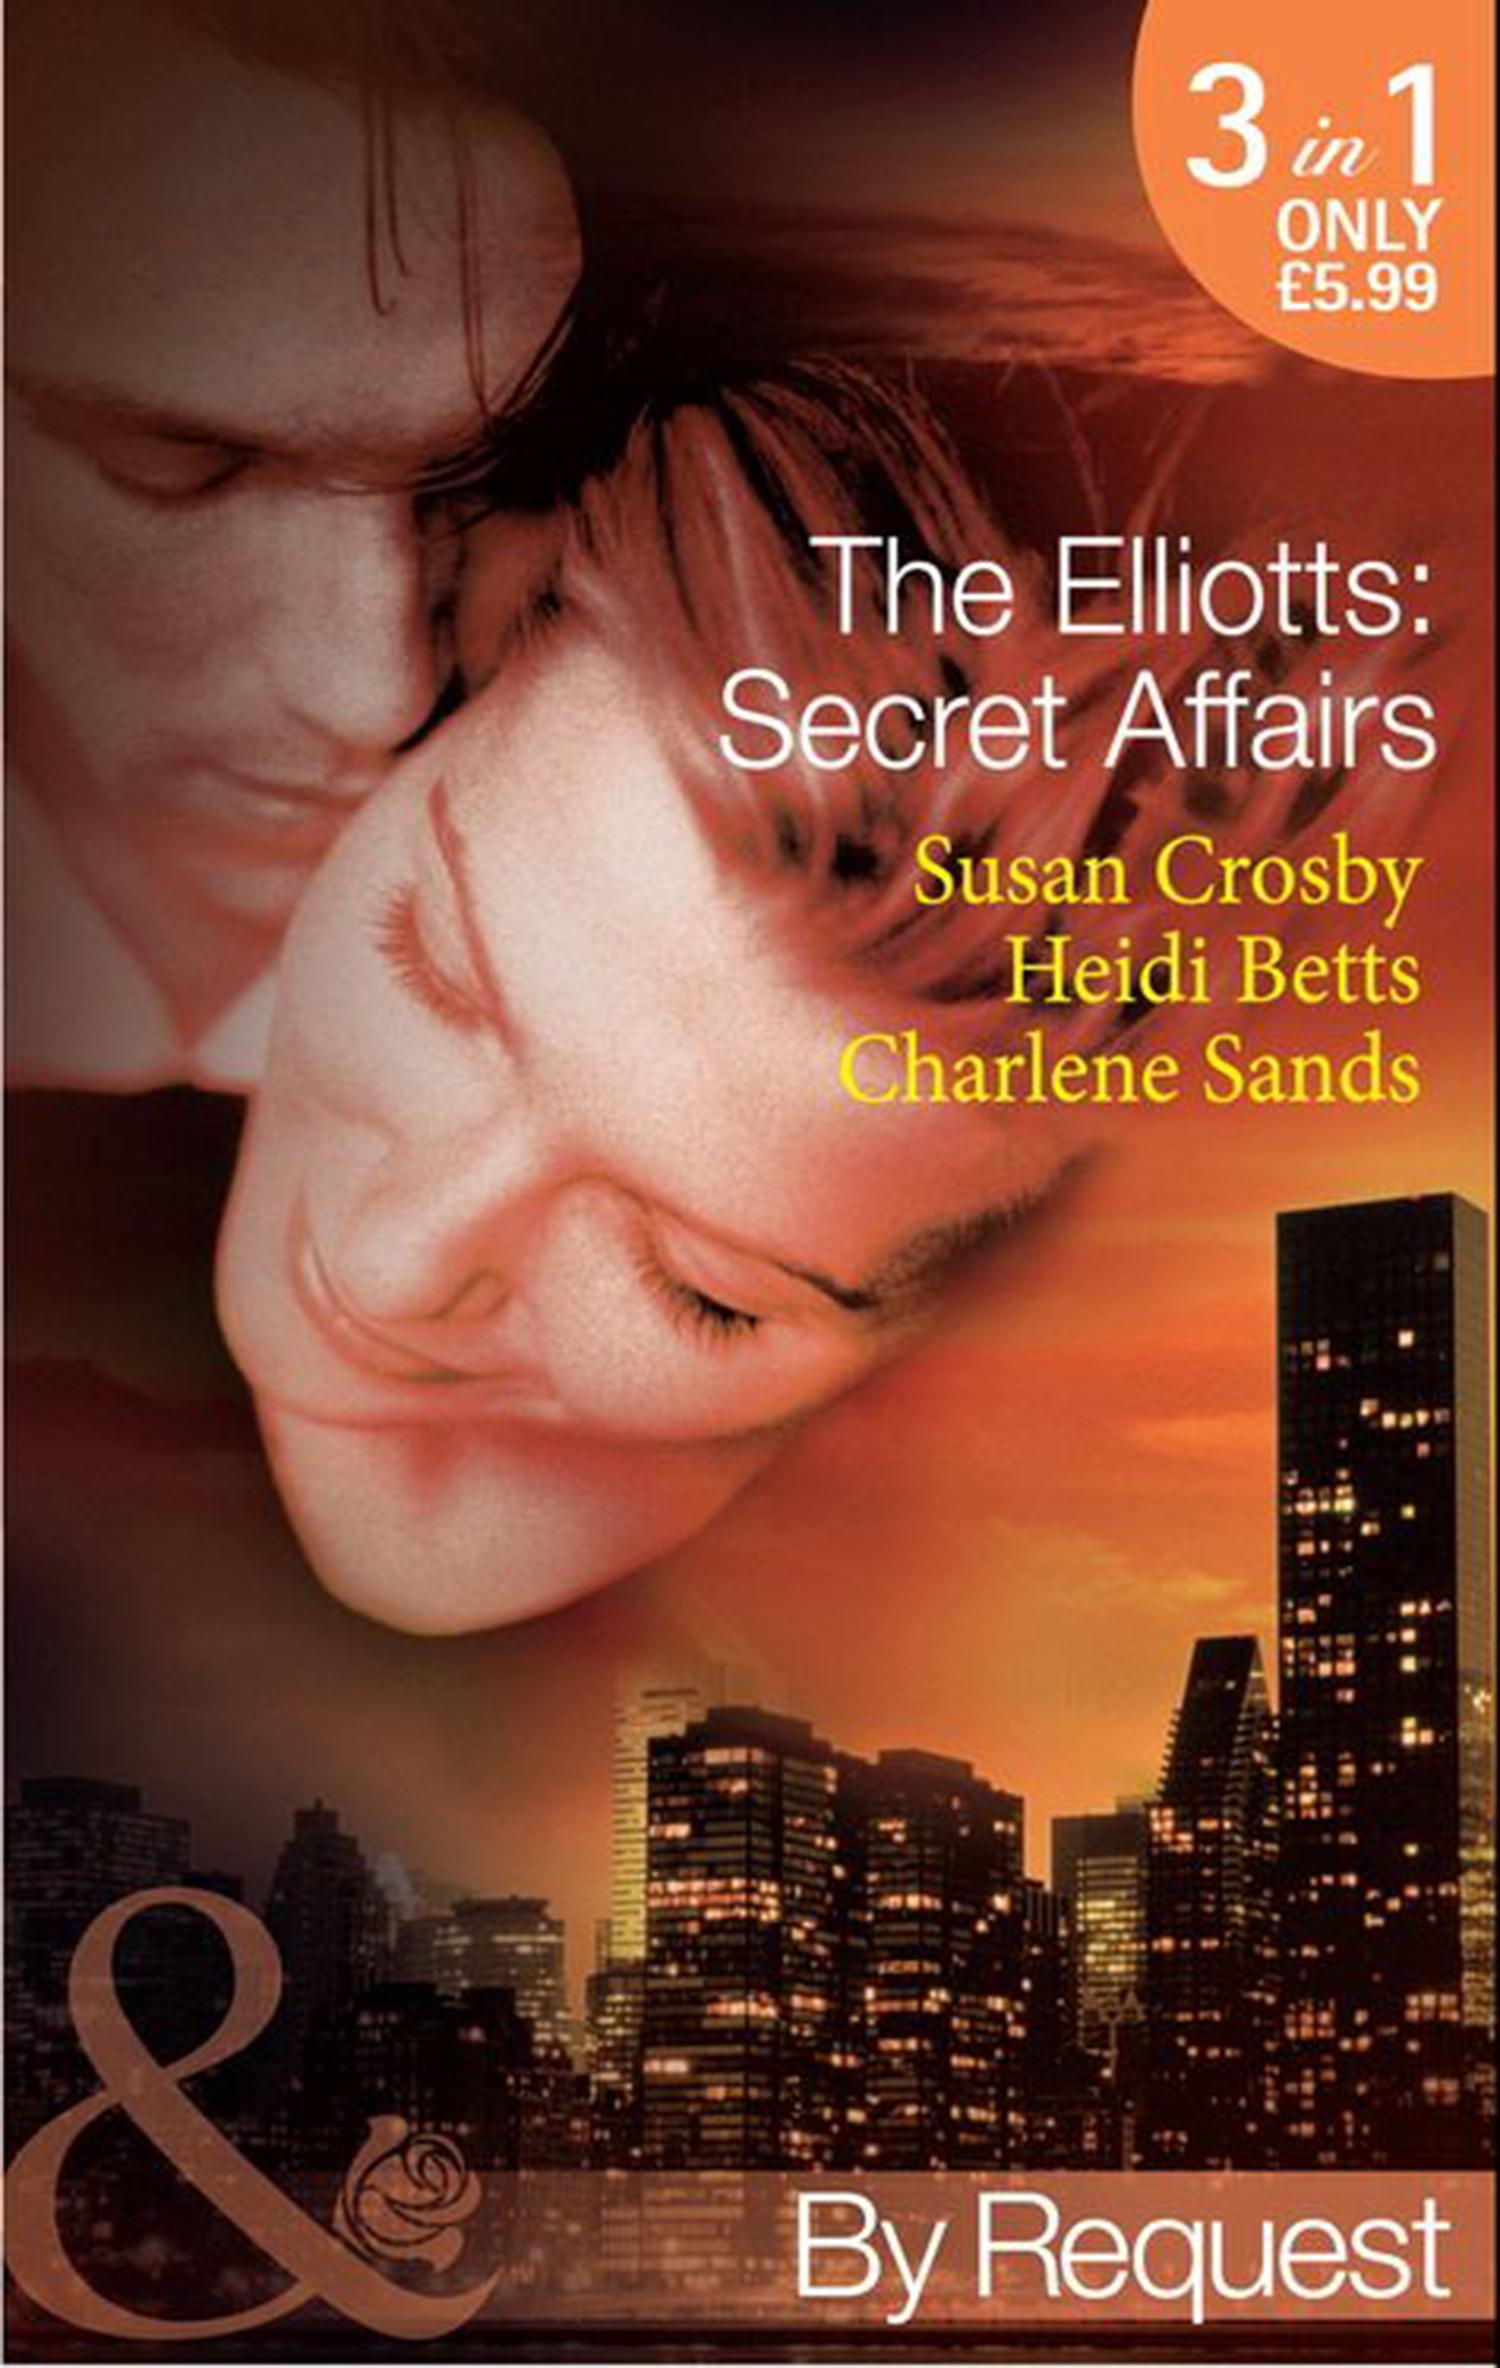 The Elliotts: Secret Affairs: The Forbidden Twin